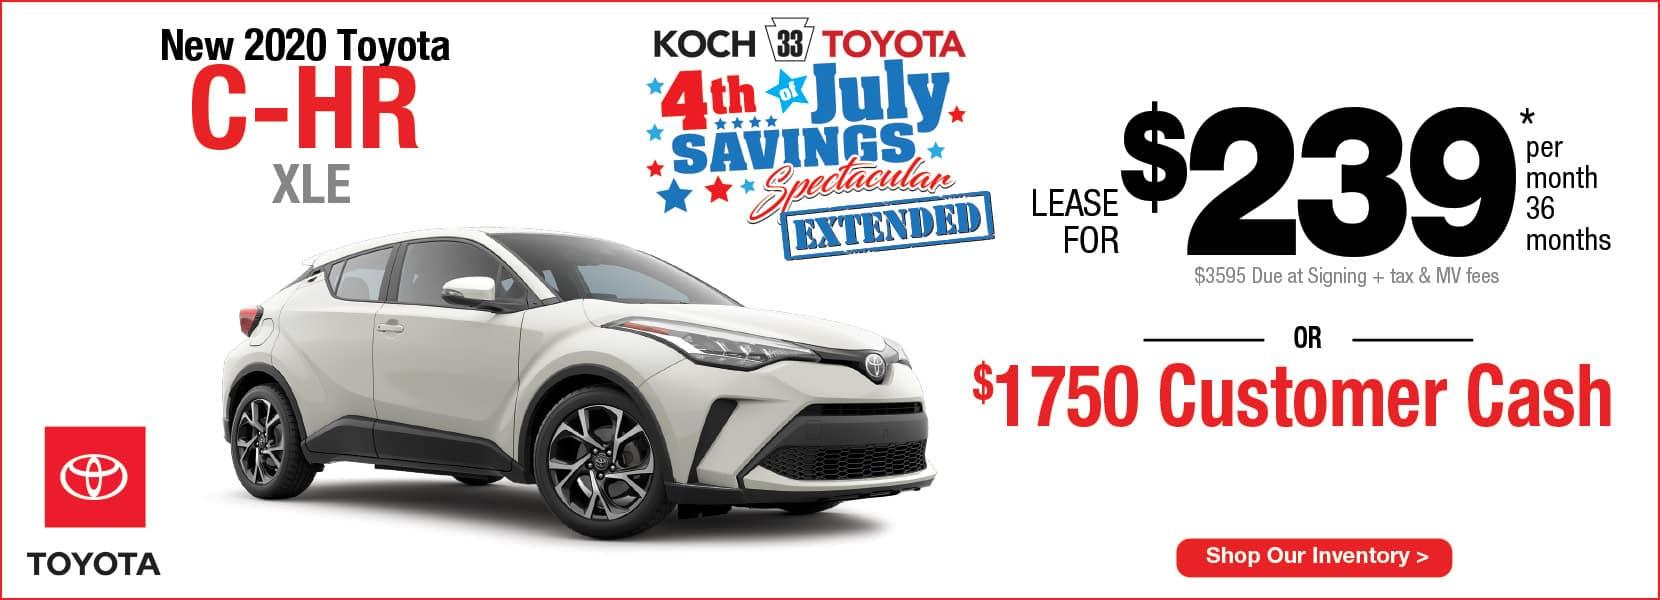 New 2020 Toyota C-HR Lease Koch 33 Toyota Easton PA